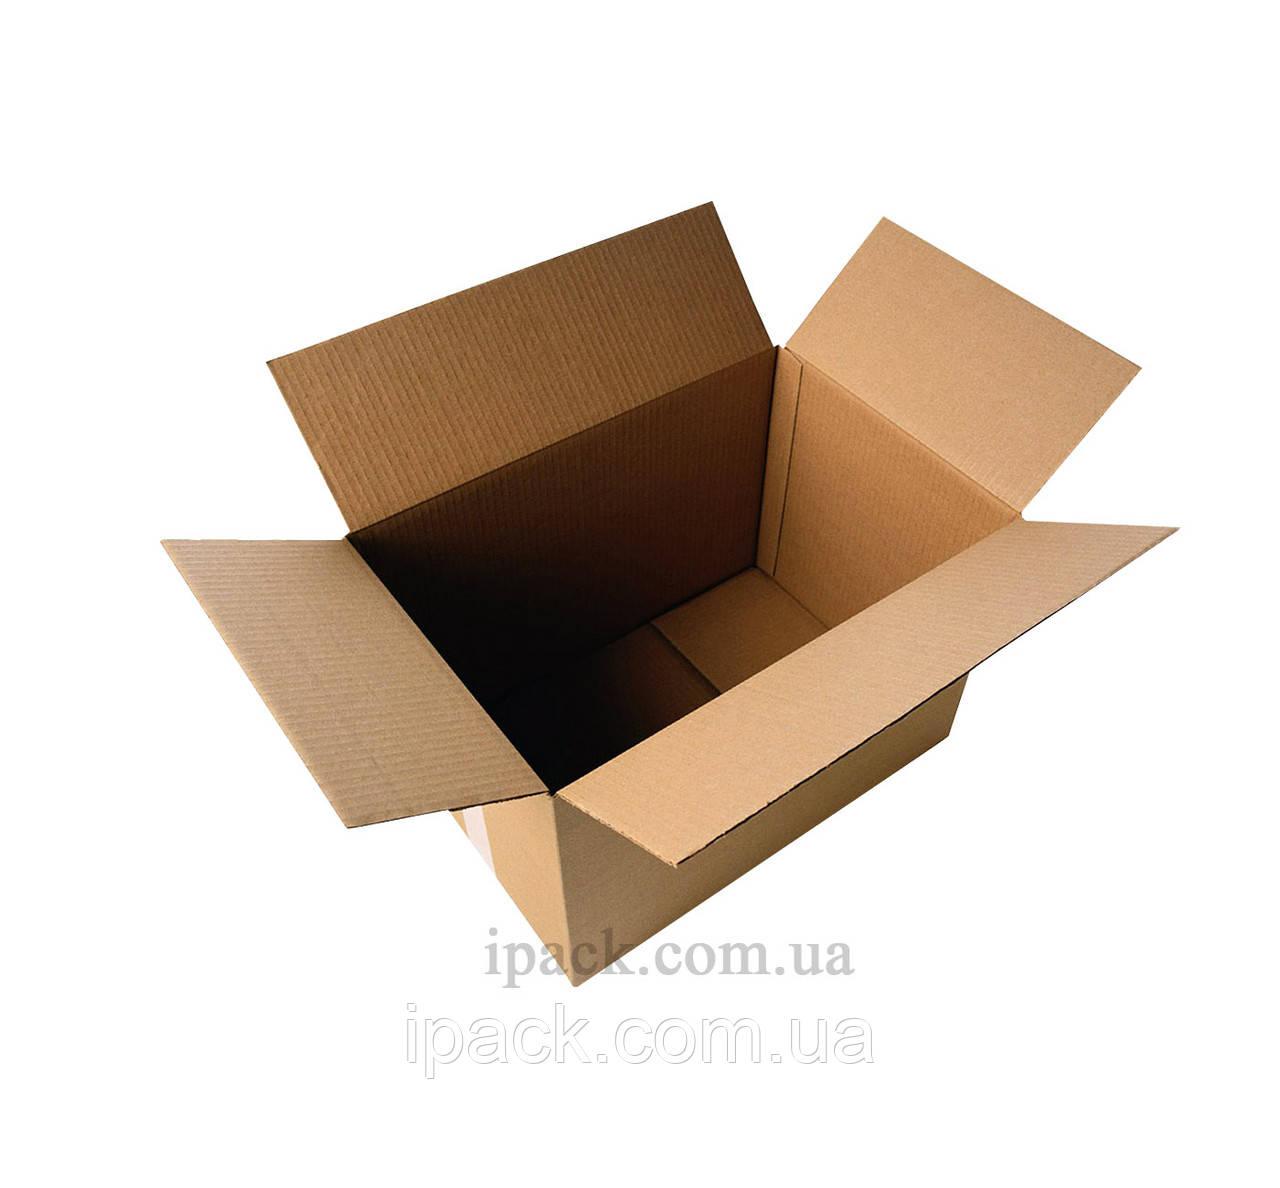 Гофроящик 800*170*130 мм бурый четырехклапанный картонный короб